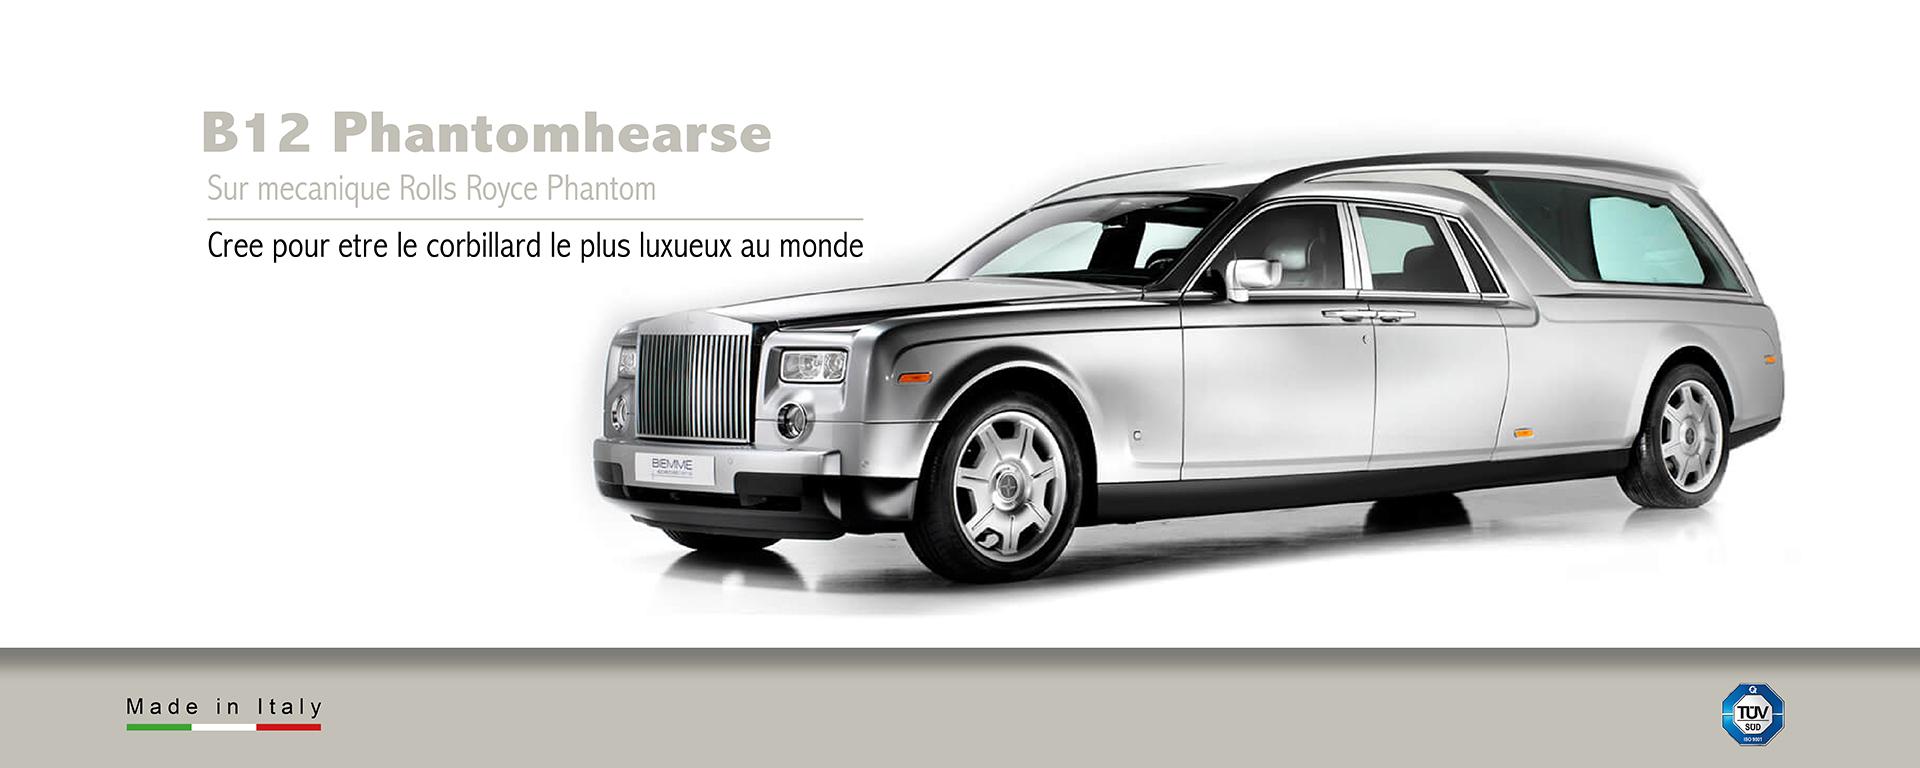 Corbillard sur mecanique Rolls Royce Phantom